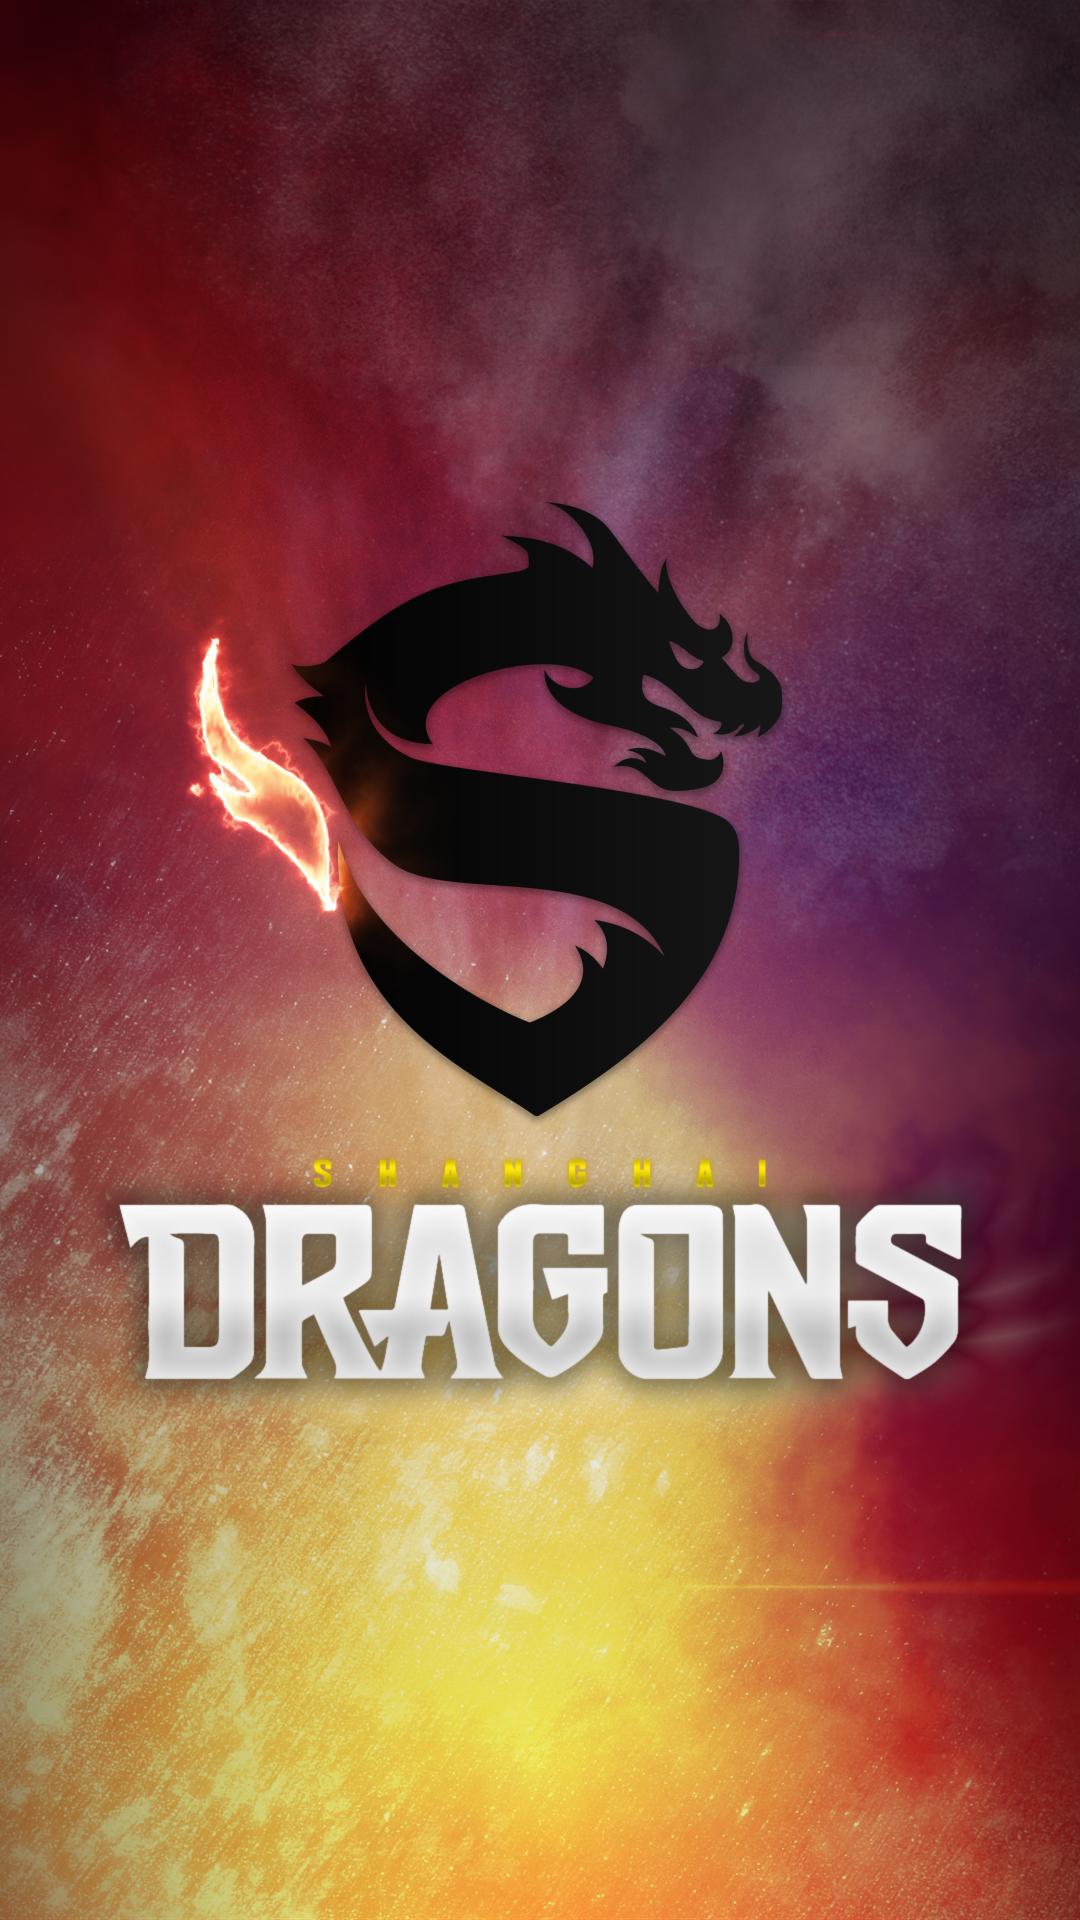 Wallpaper Overwatch League E Sports Shanghai Dragons 1080x1920